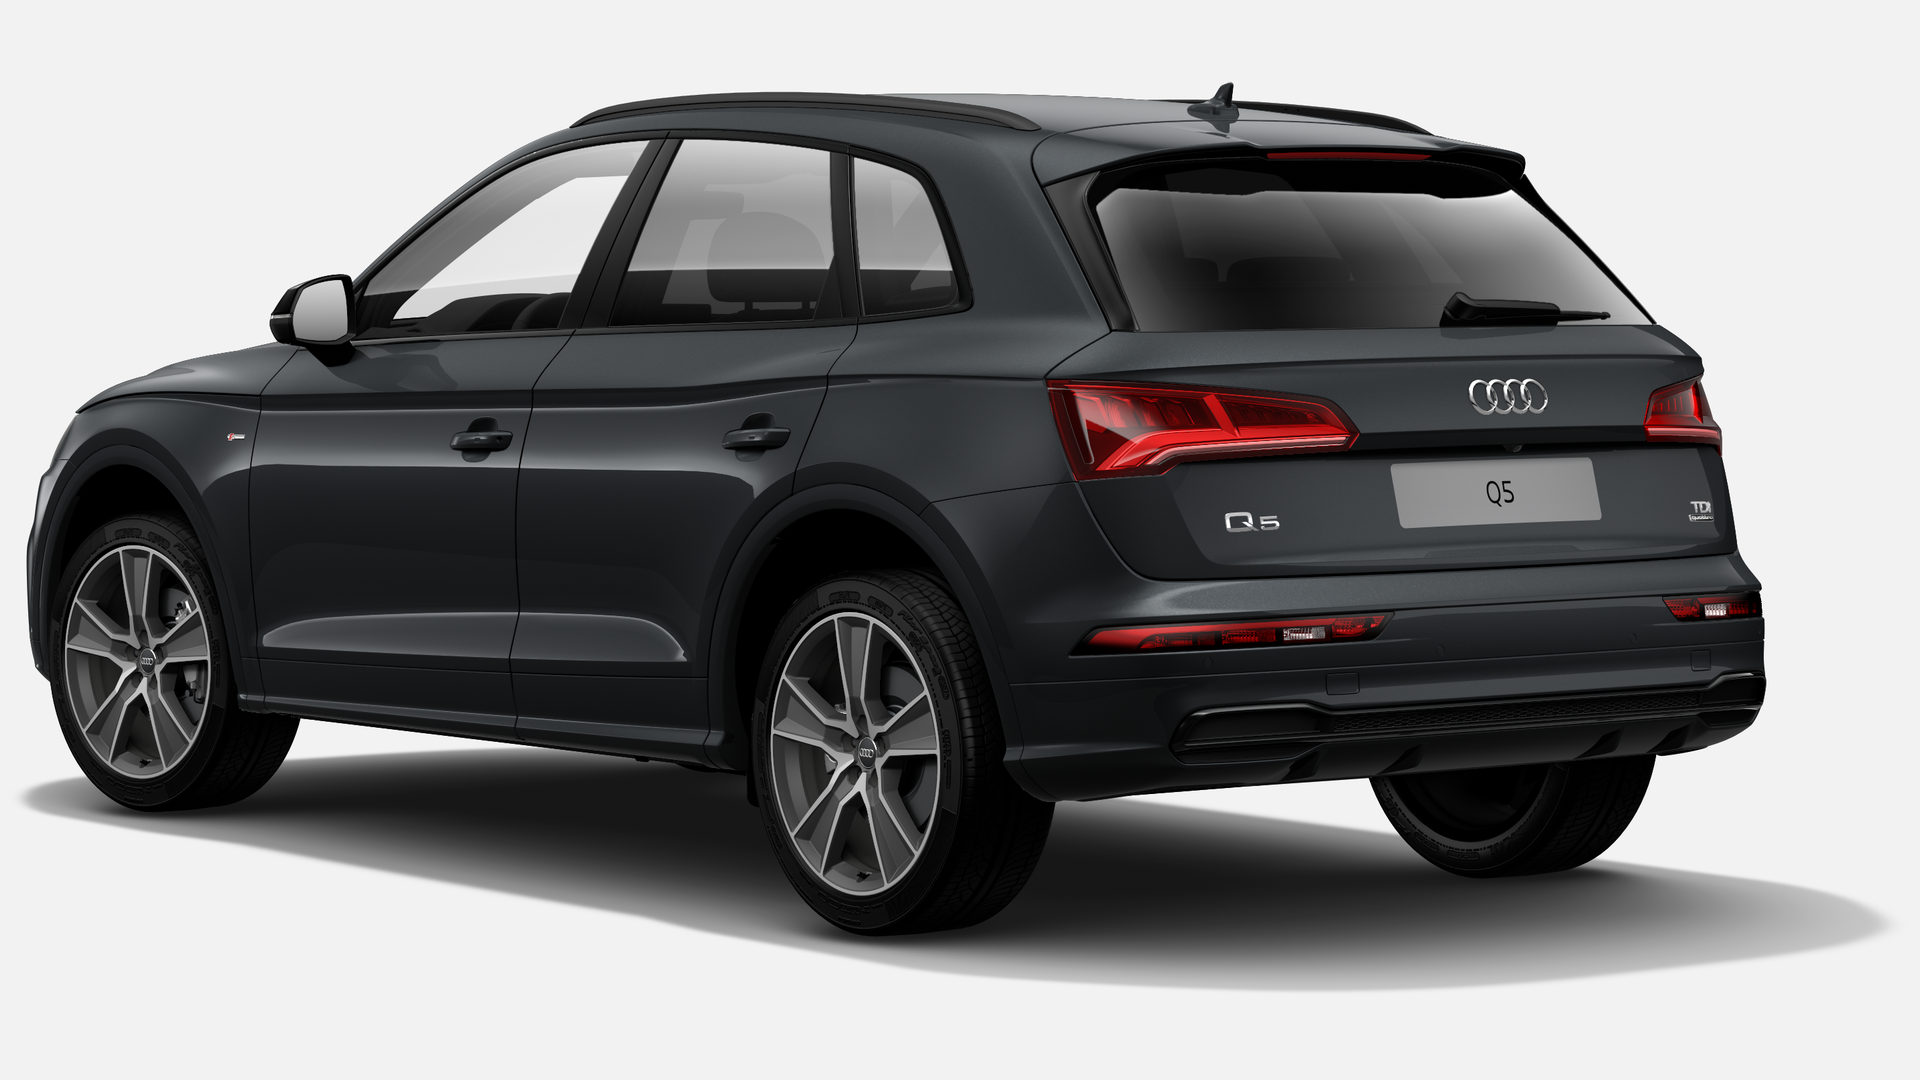 Audi Q5 2.0 TDI ultra S line quattro S tronic 140 kW (190 CV)